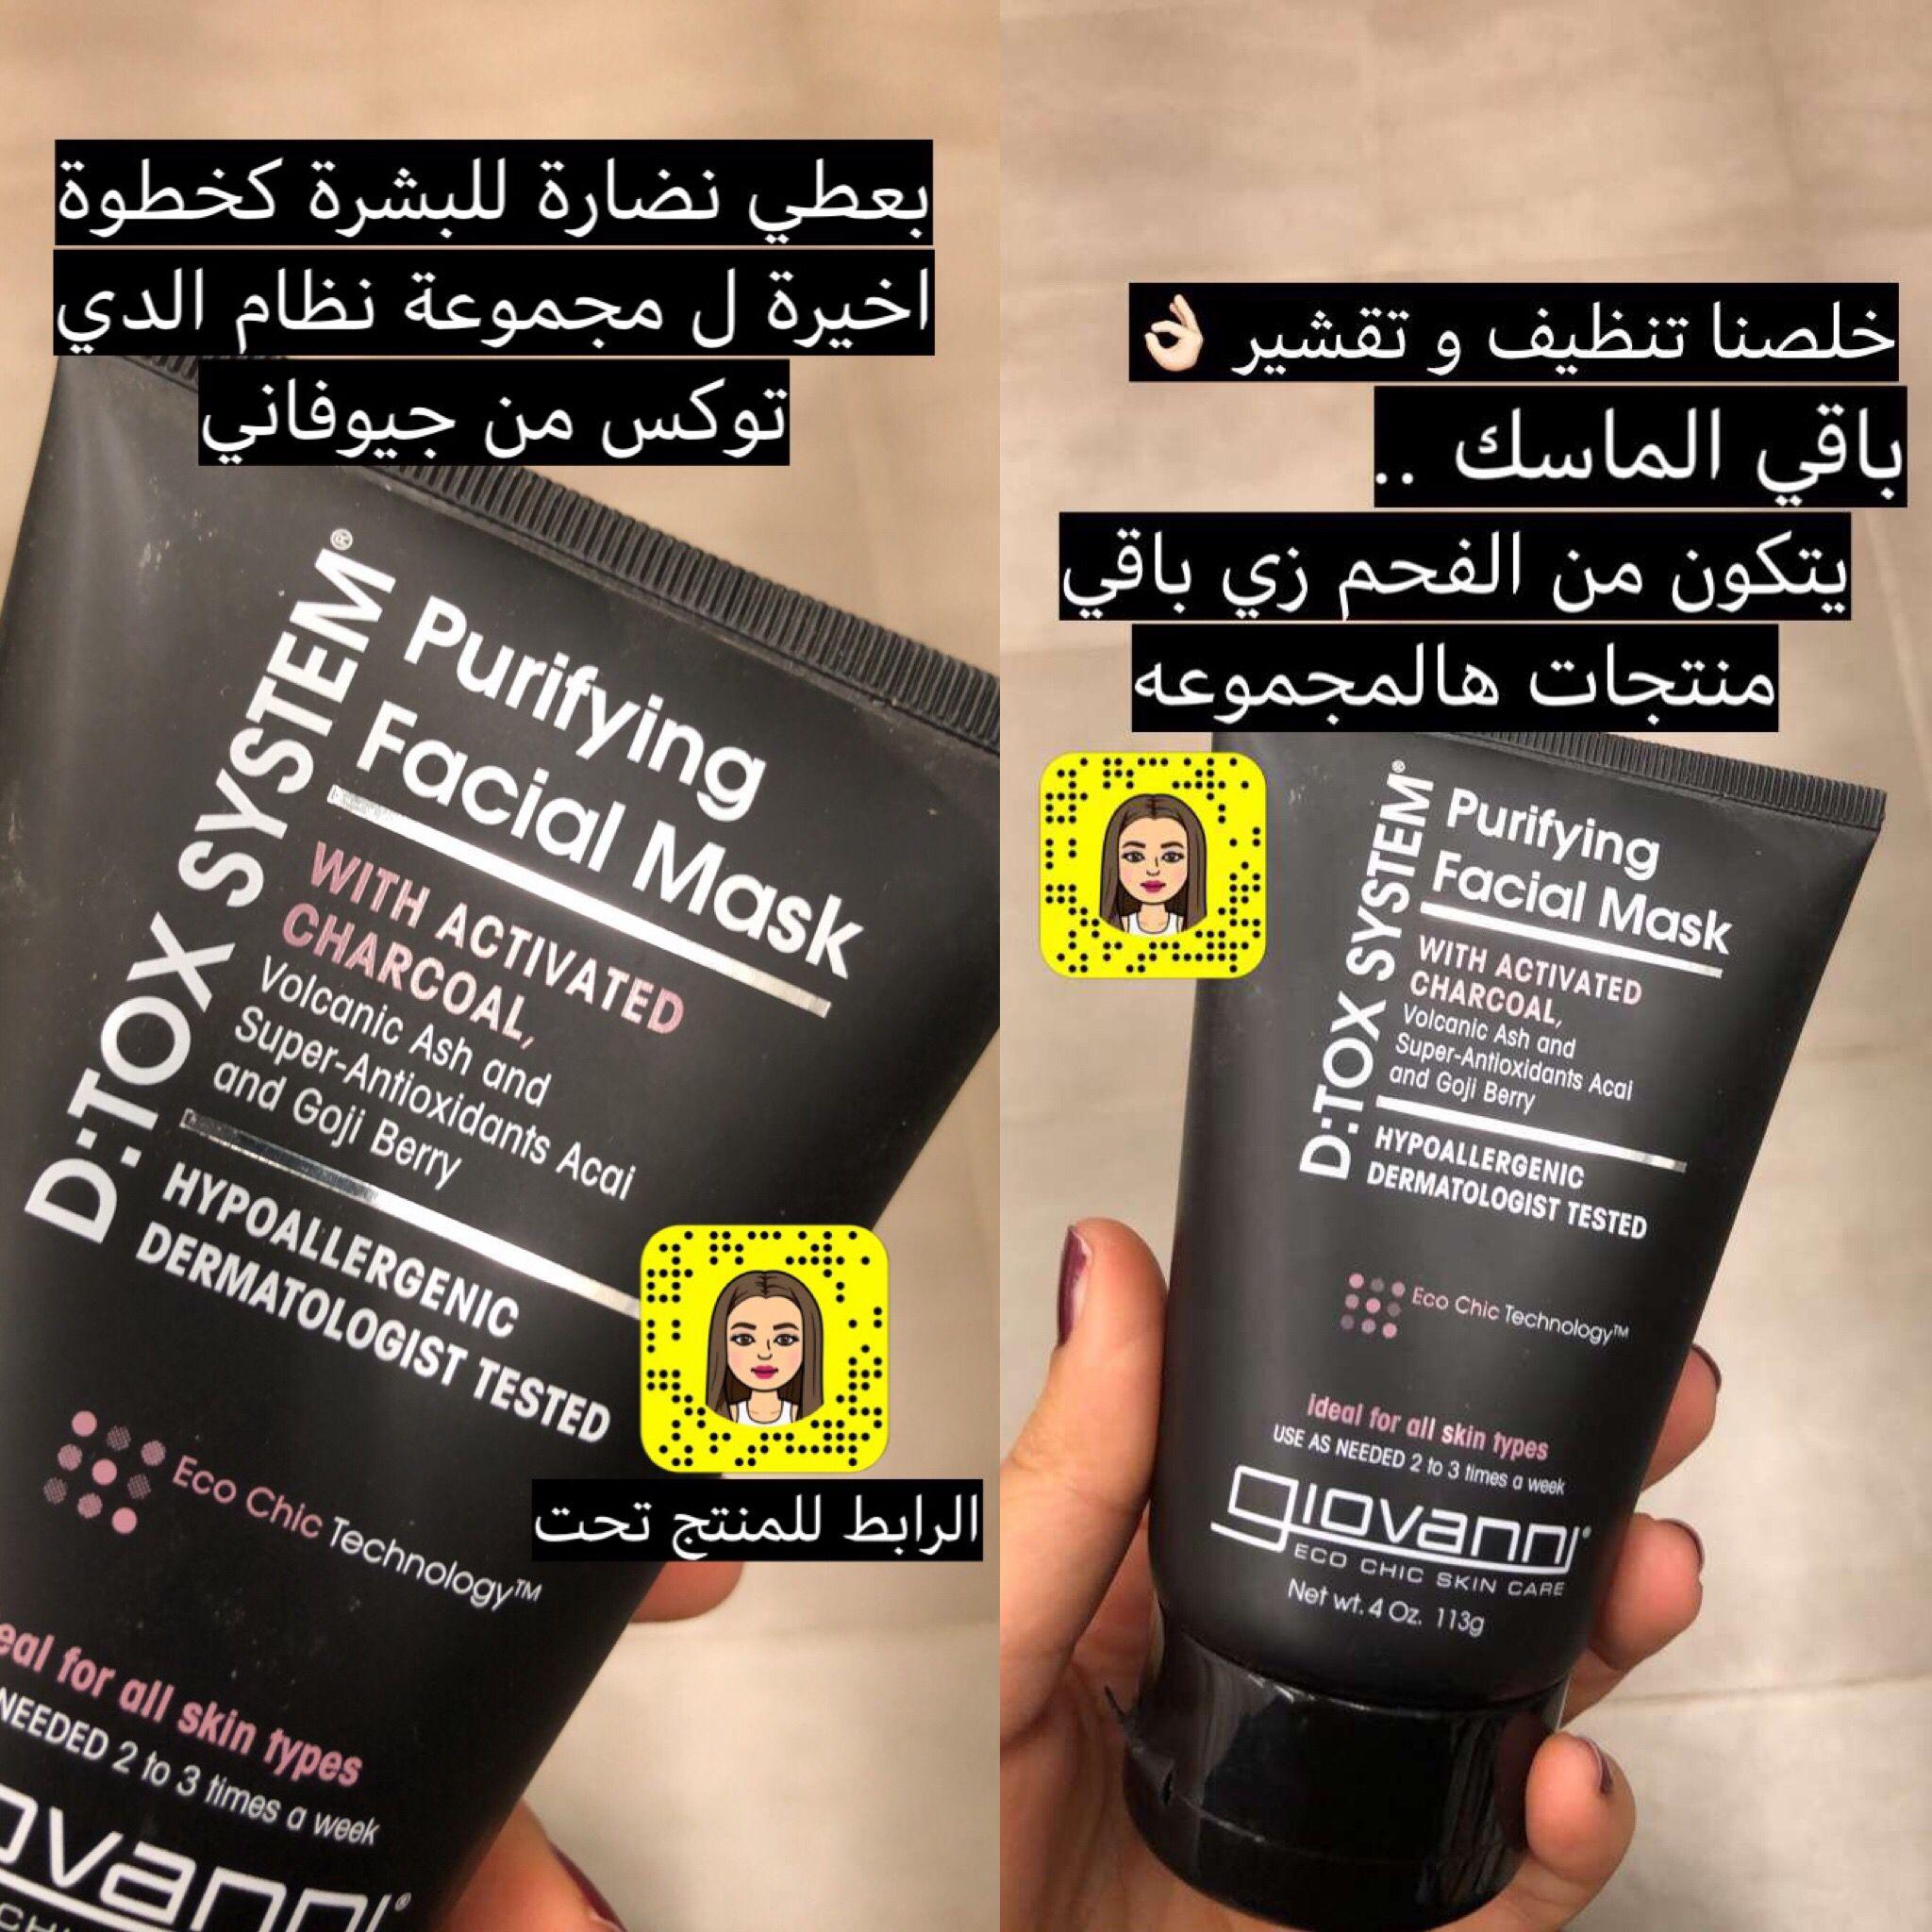 Giovanni Dermatologist Tested Purifying Mask Acai Berry